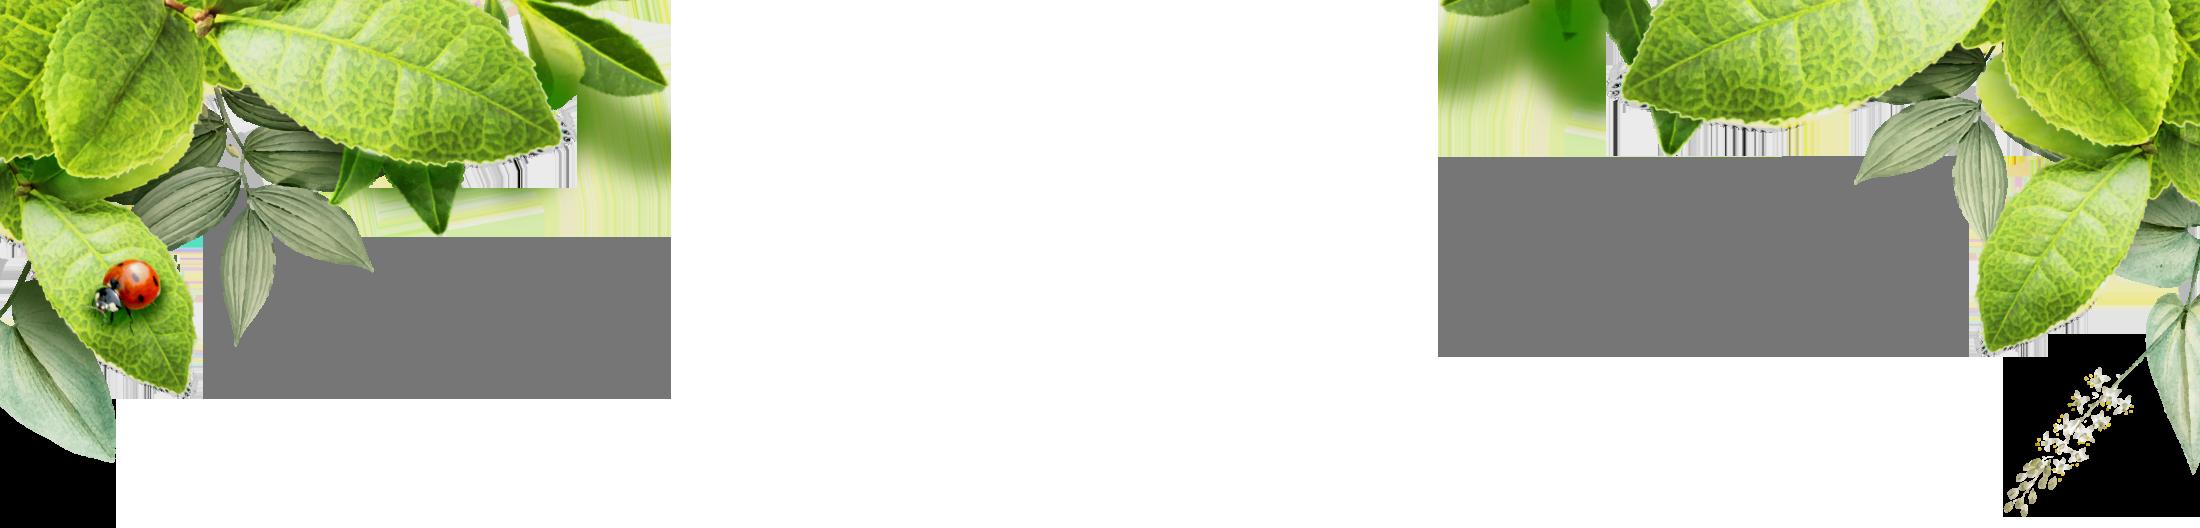 Allplant-450g-bg.png